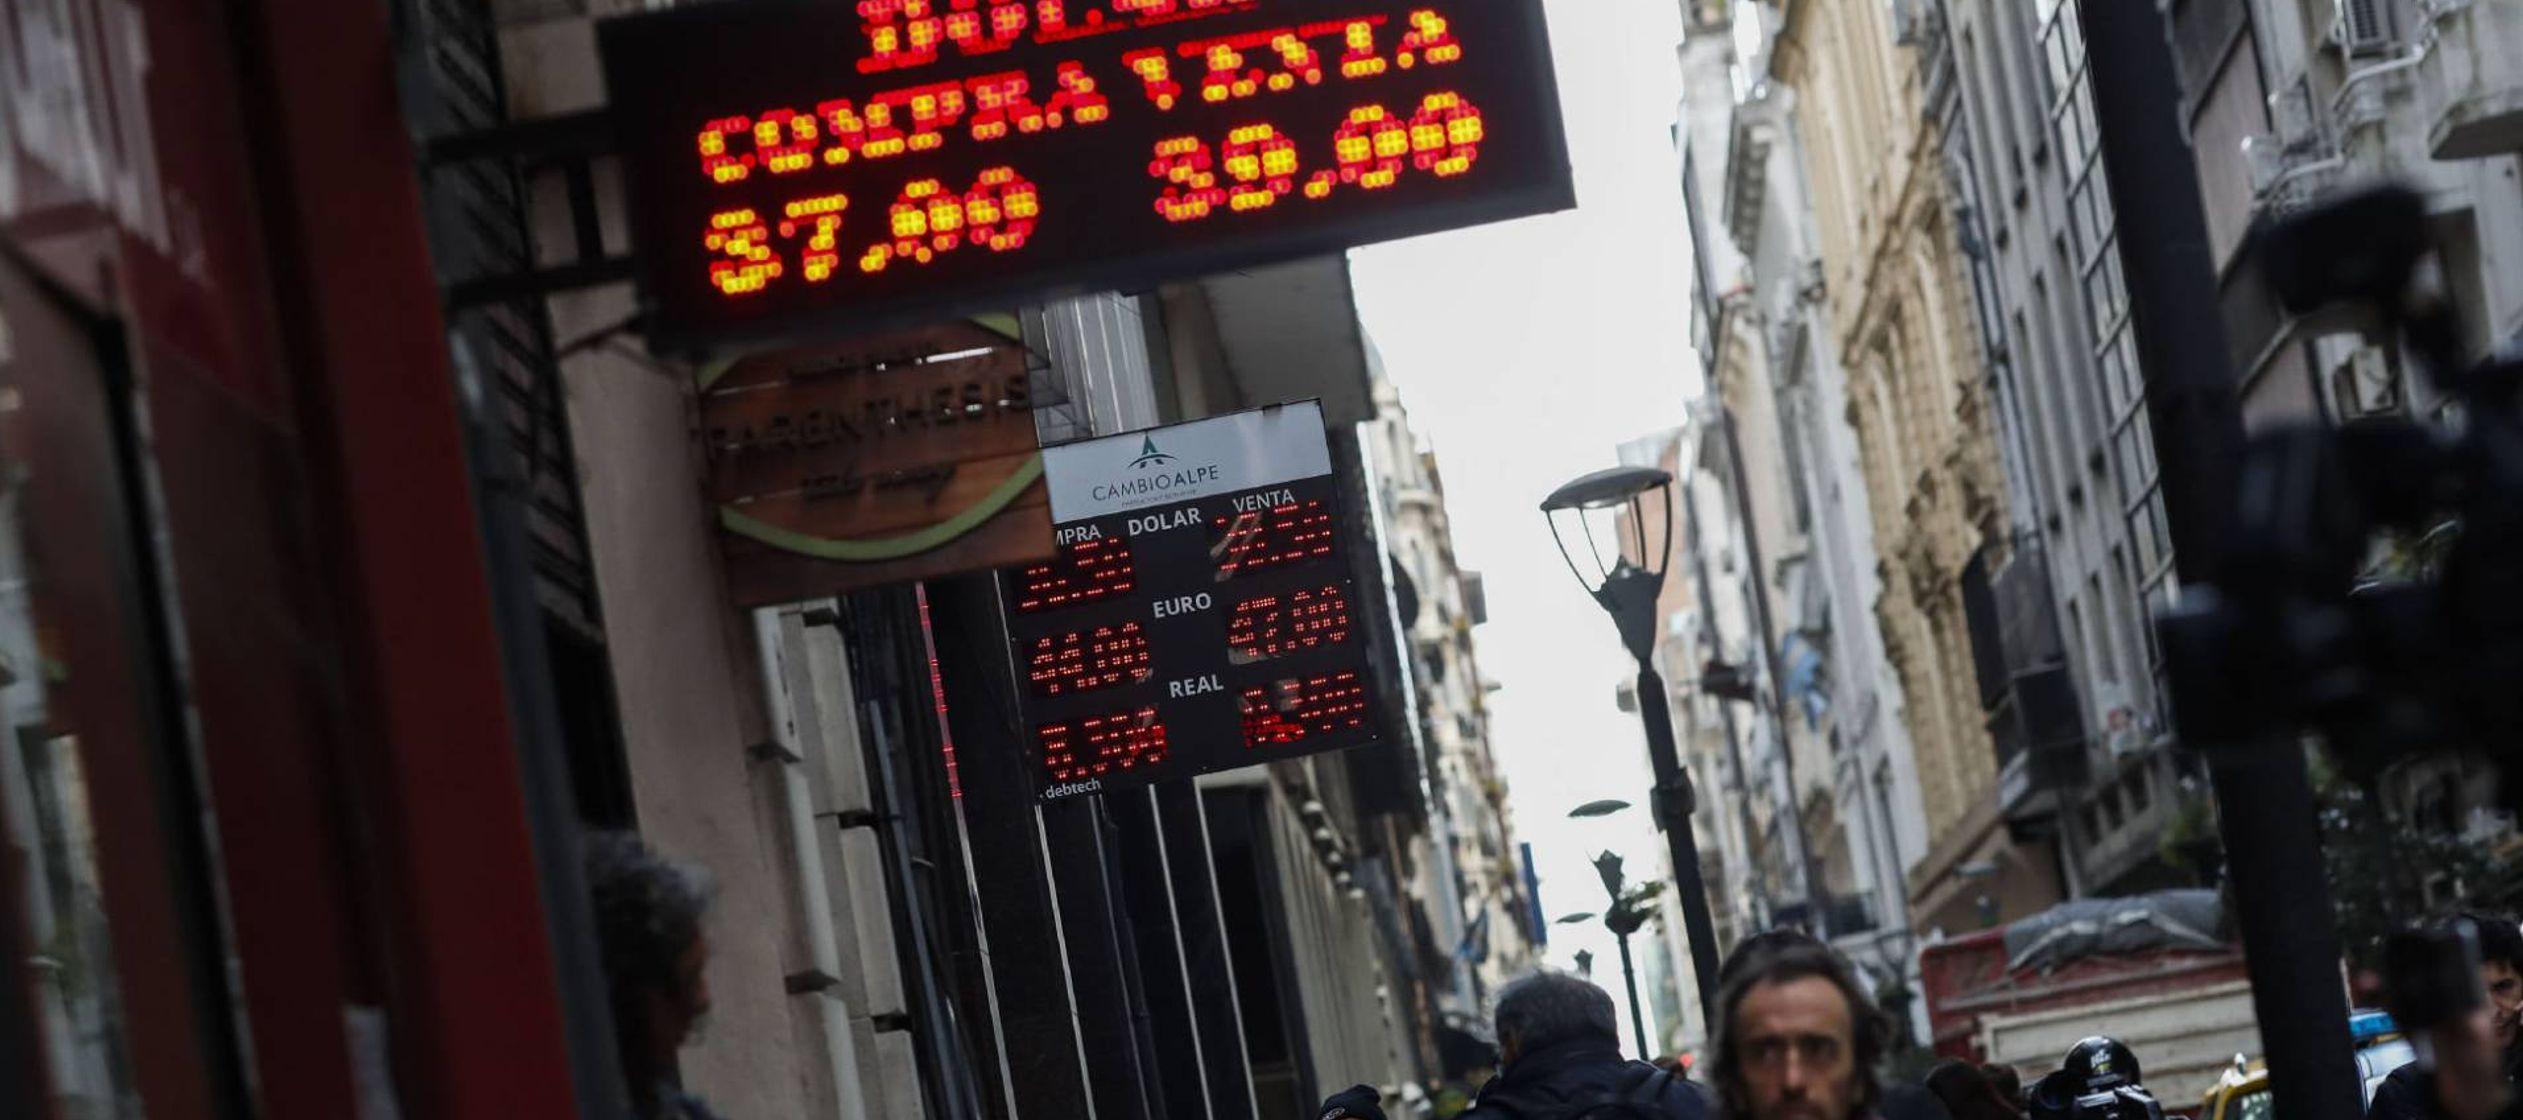 Al desplome de la lira turca se une ahora la inestabilidad de la divisa argentina